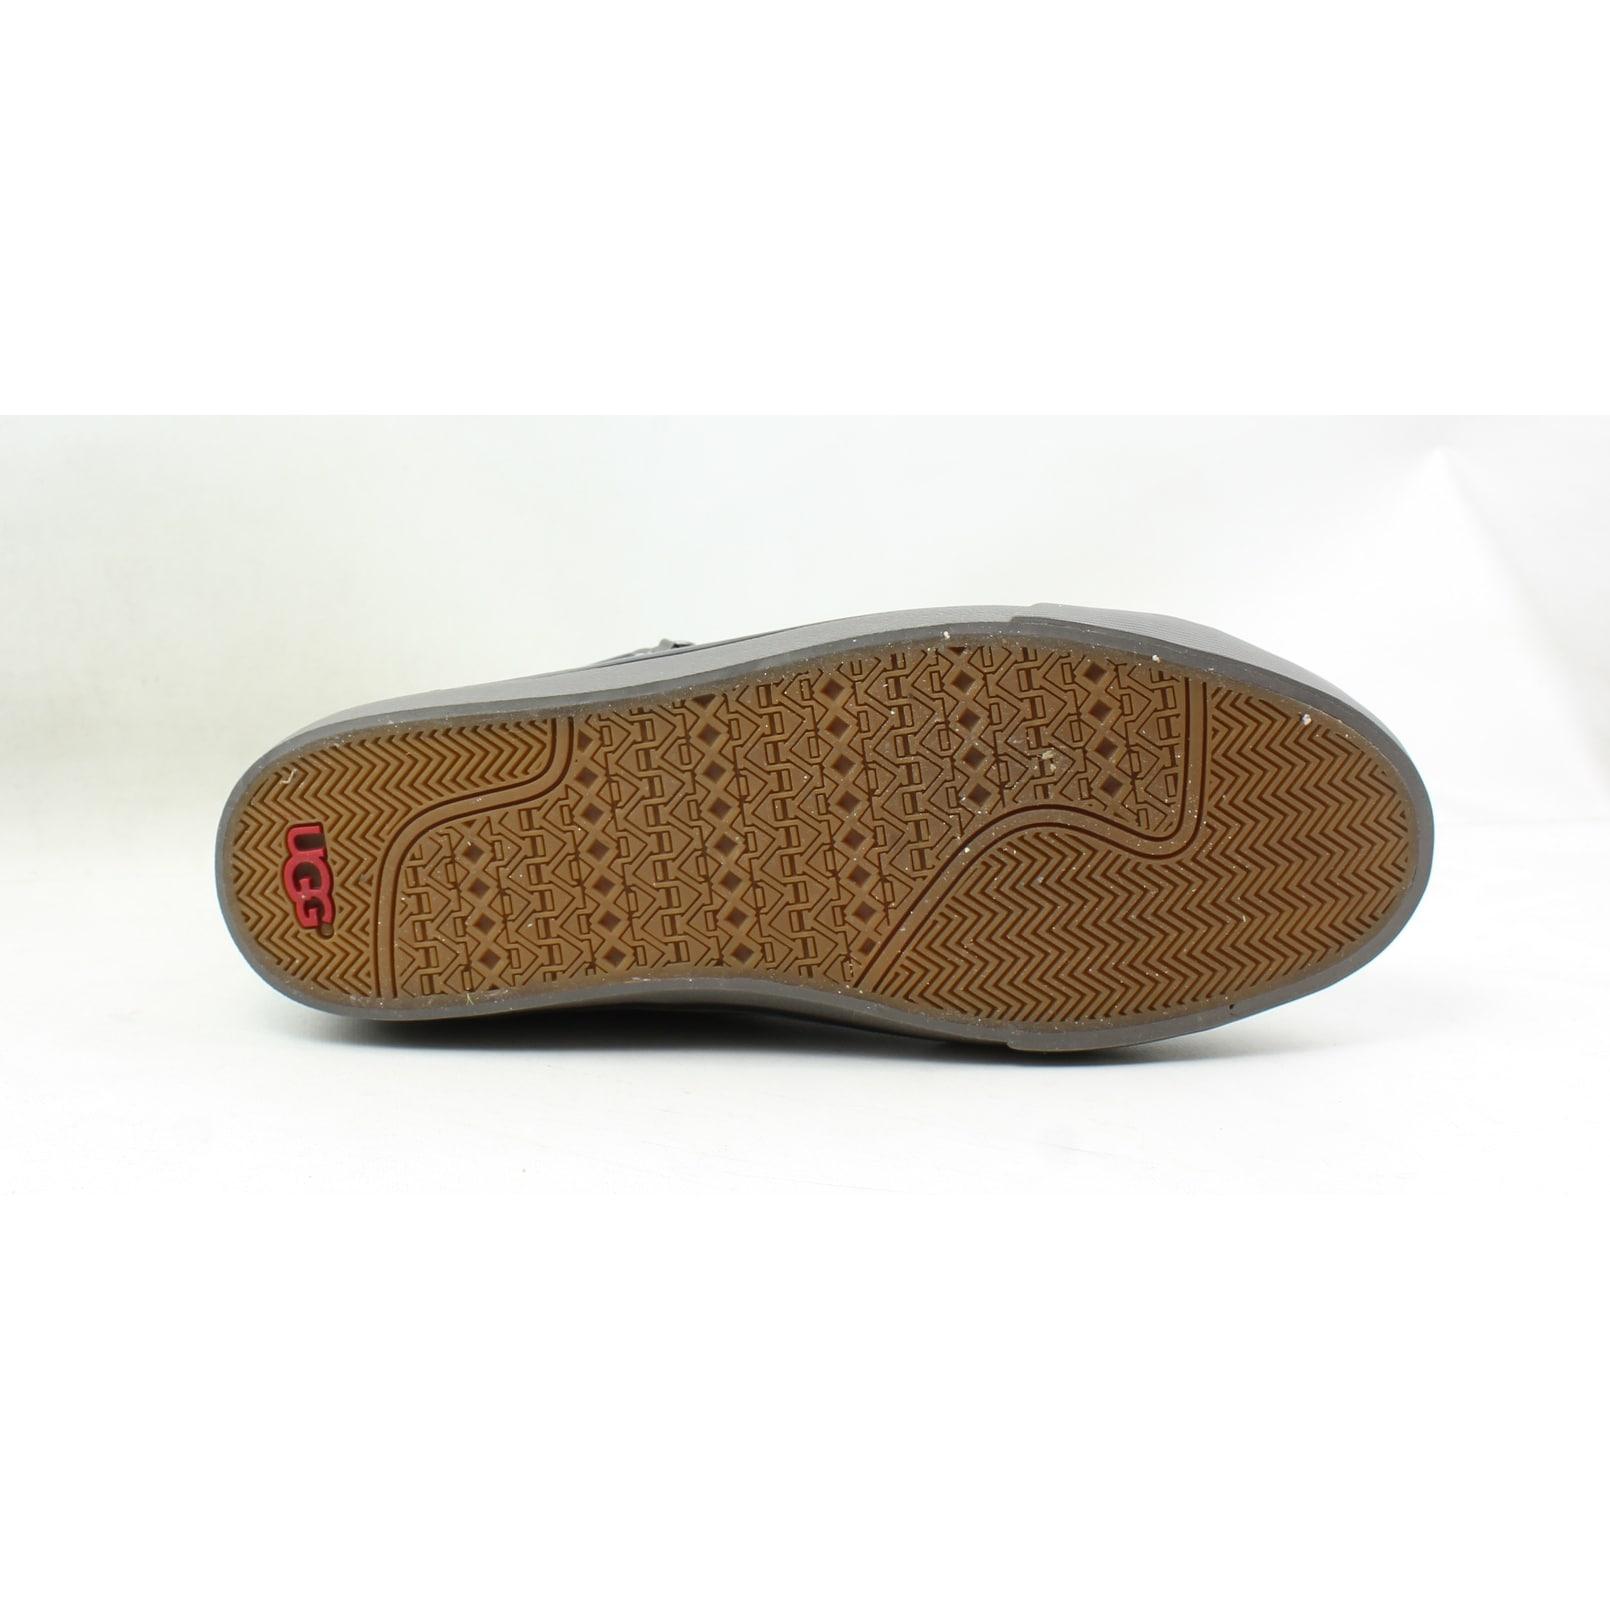 77835f6fb54 UGG Mens Hoyt Ii True Navy Fashion Sneaker Size 10.5